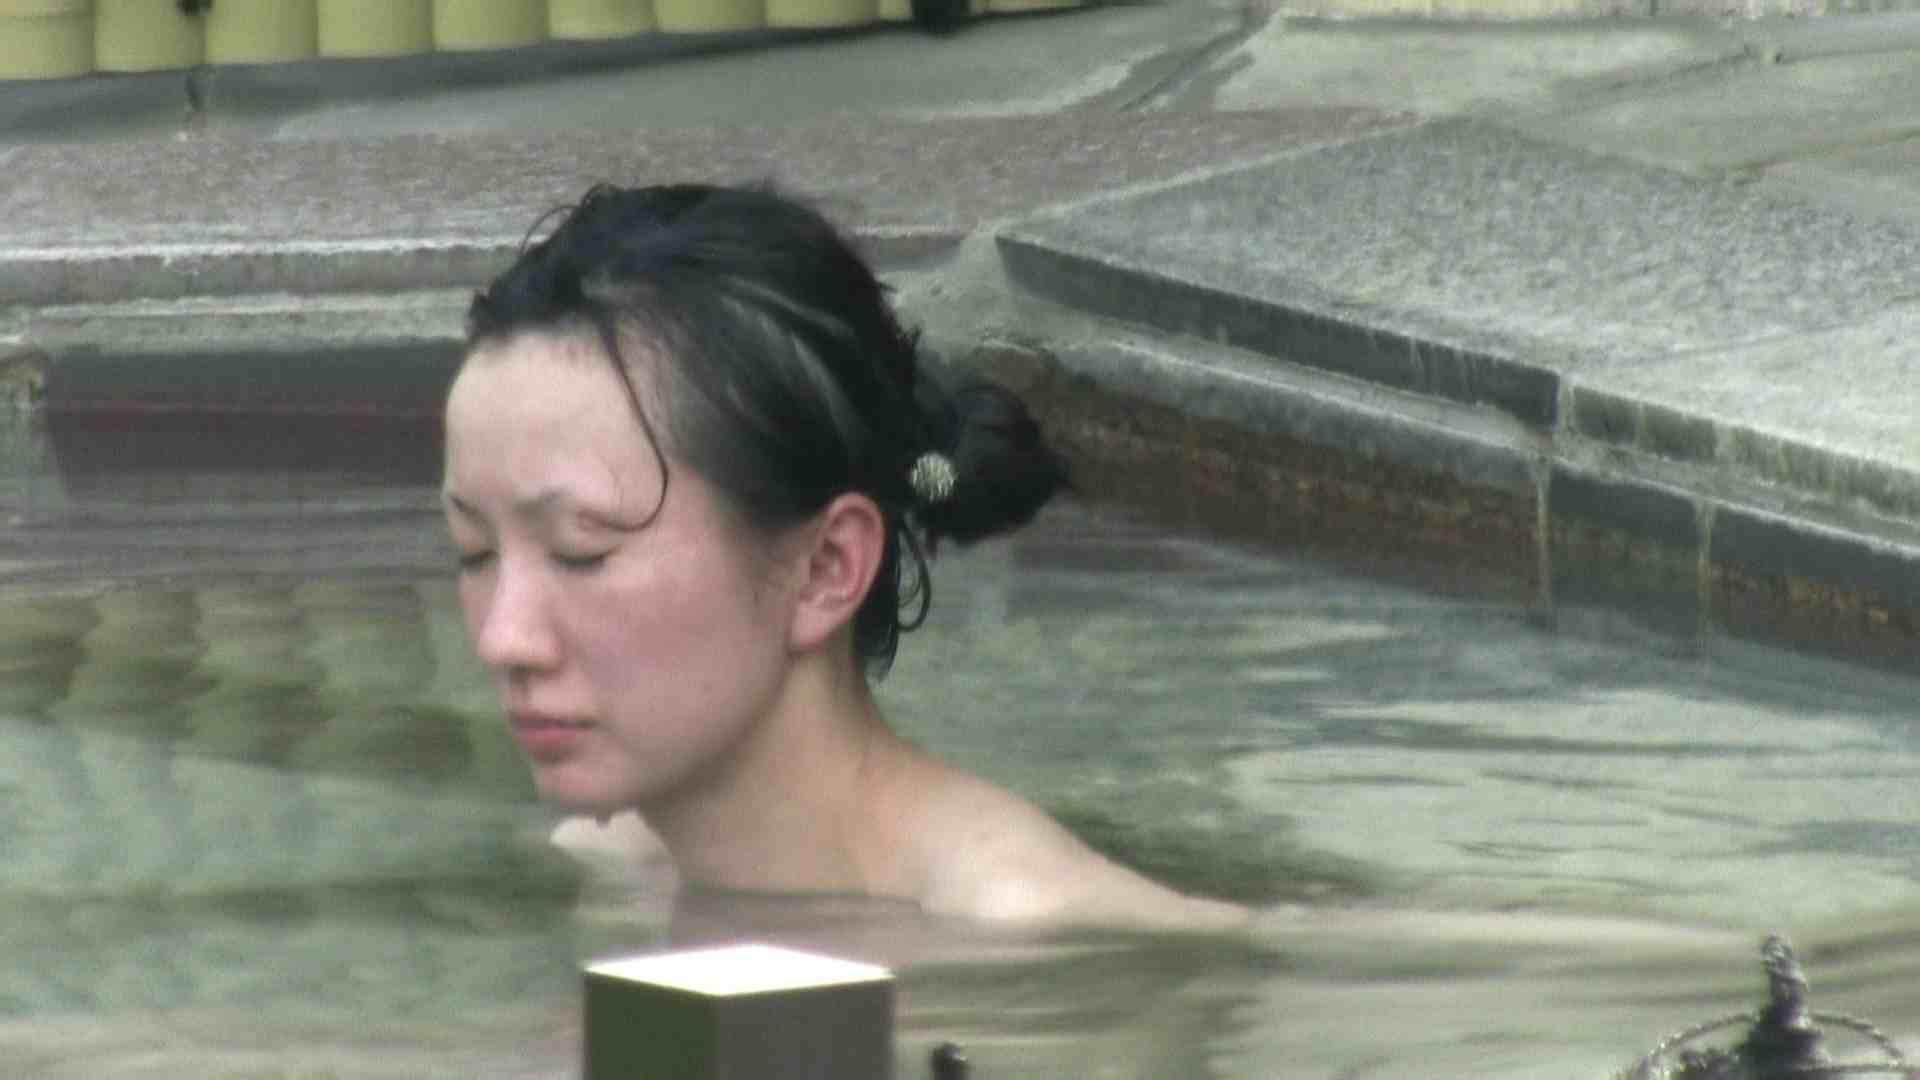 Aquaな露天風呂Vol.663 0 | 0  20連発 5